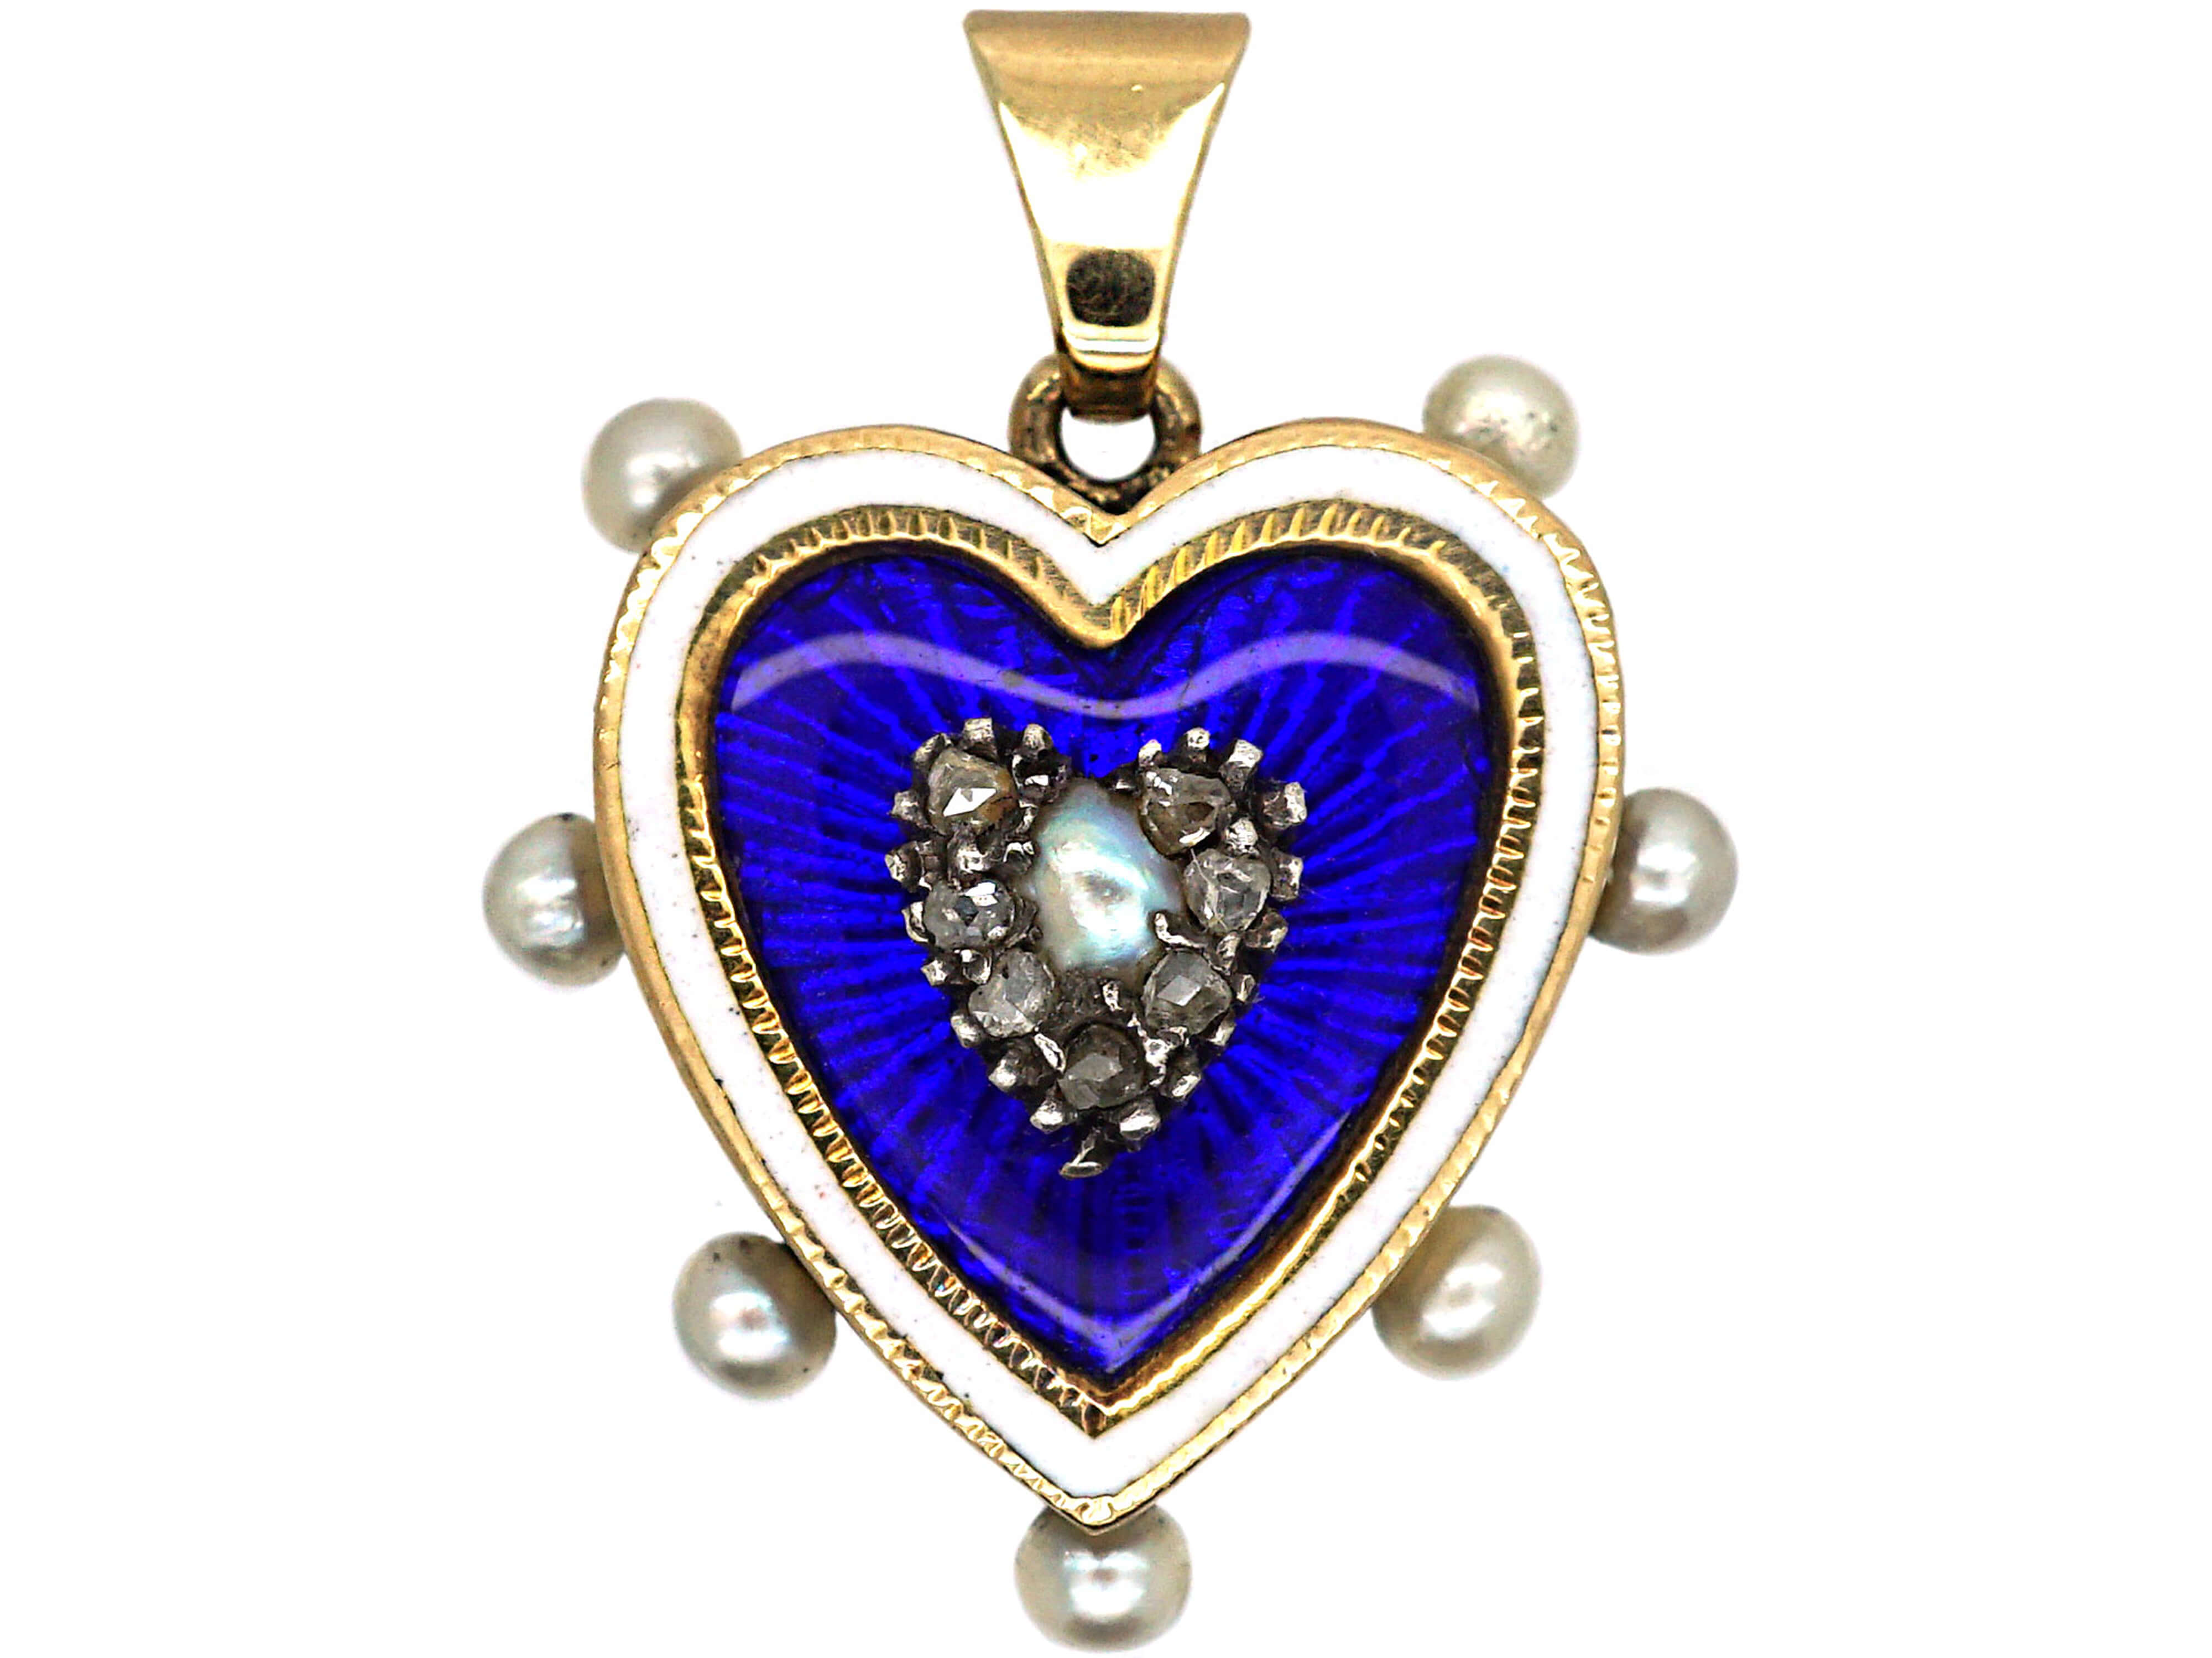 Edwardian 15ct Gold Blue & White Enamel, Natural Pearl & Rose Diamond Heart Pendant